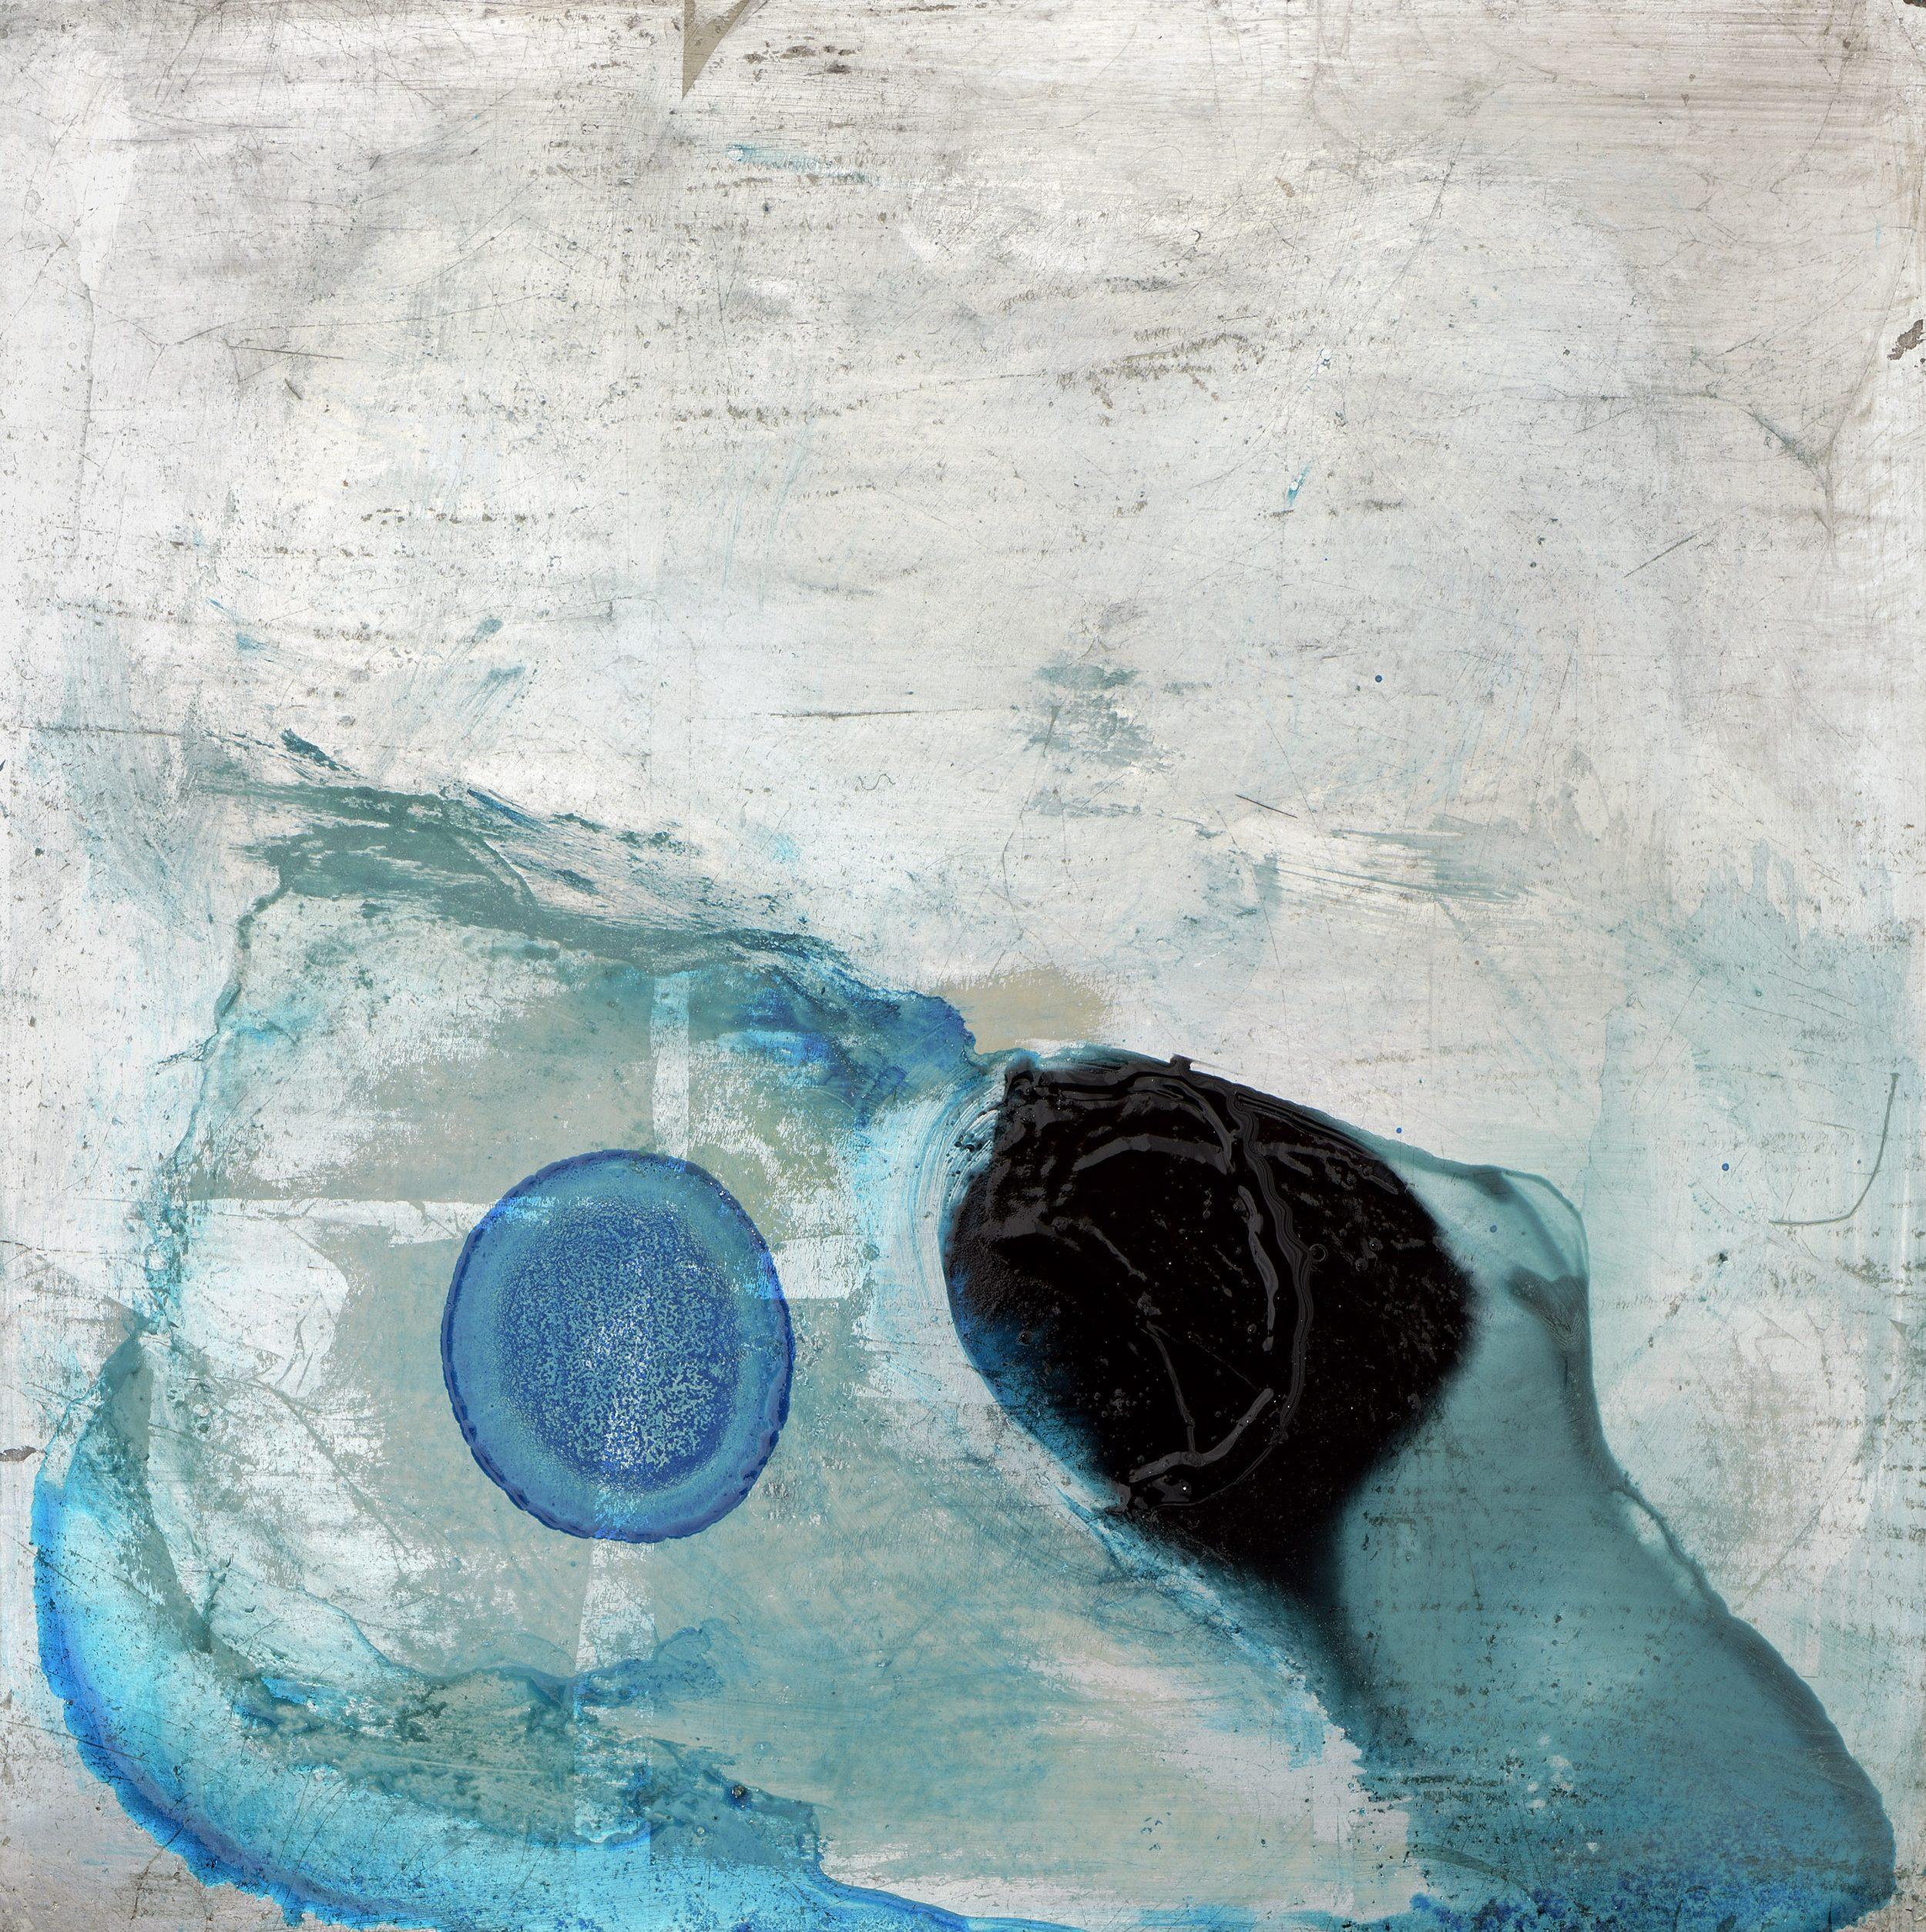 Underwater Balloon by Alice Cescatti